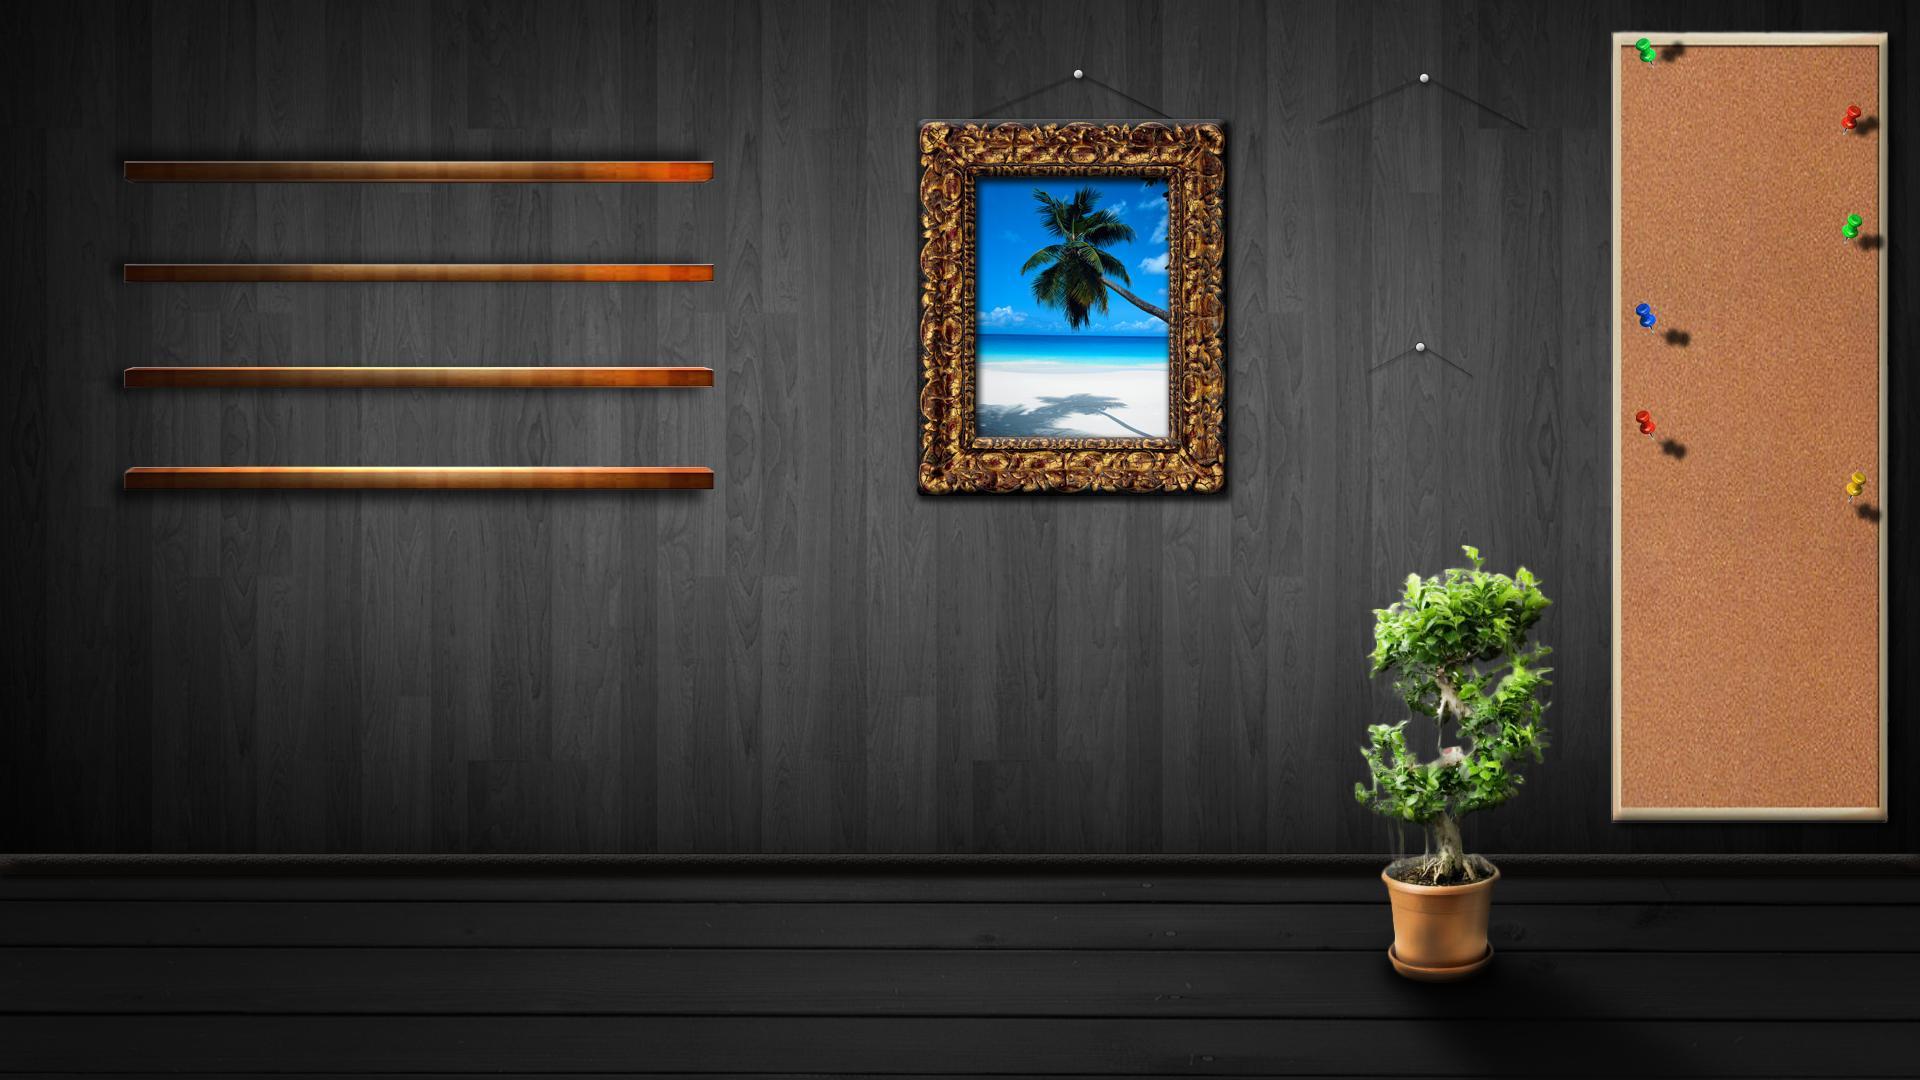 Organized Wallpaper